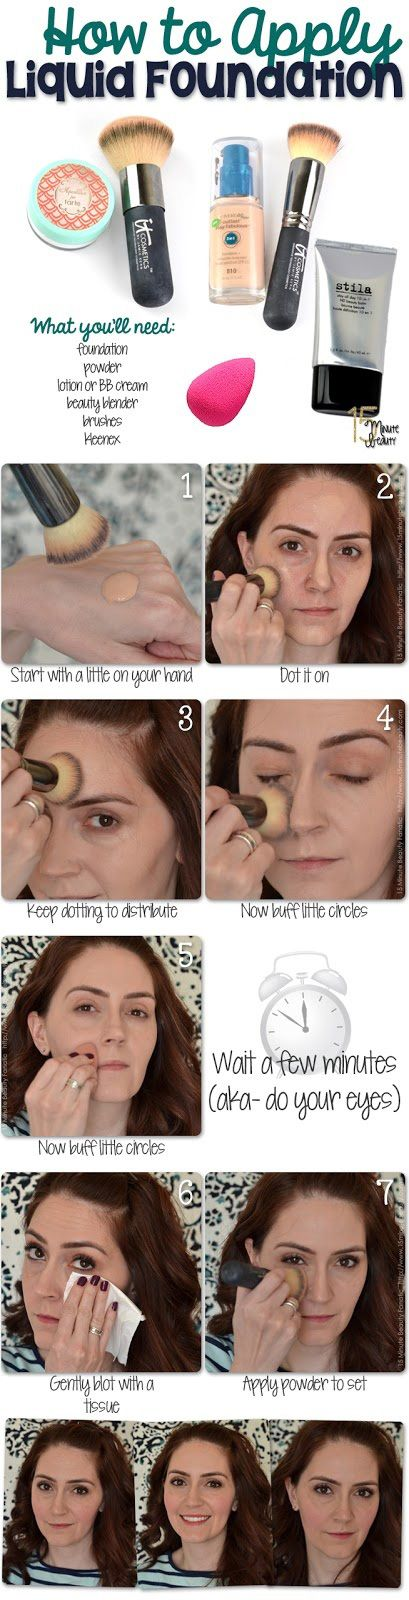 foundation tips and tricks #coupon code nicesup123 gets 25% off at  Provestra.com Skinception.com